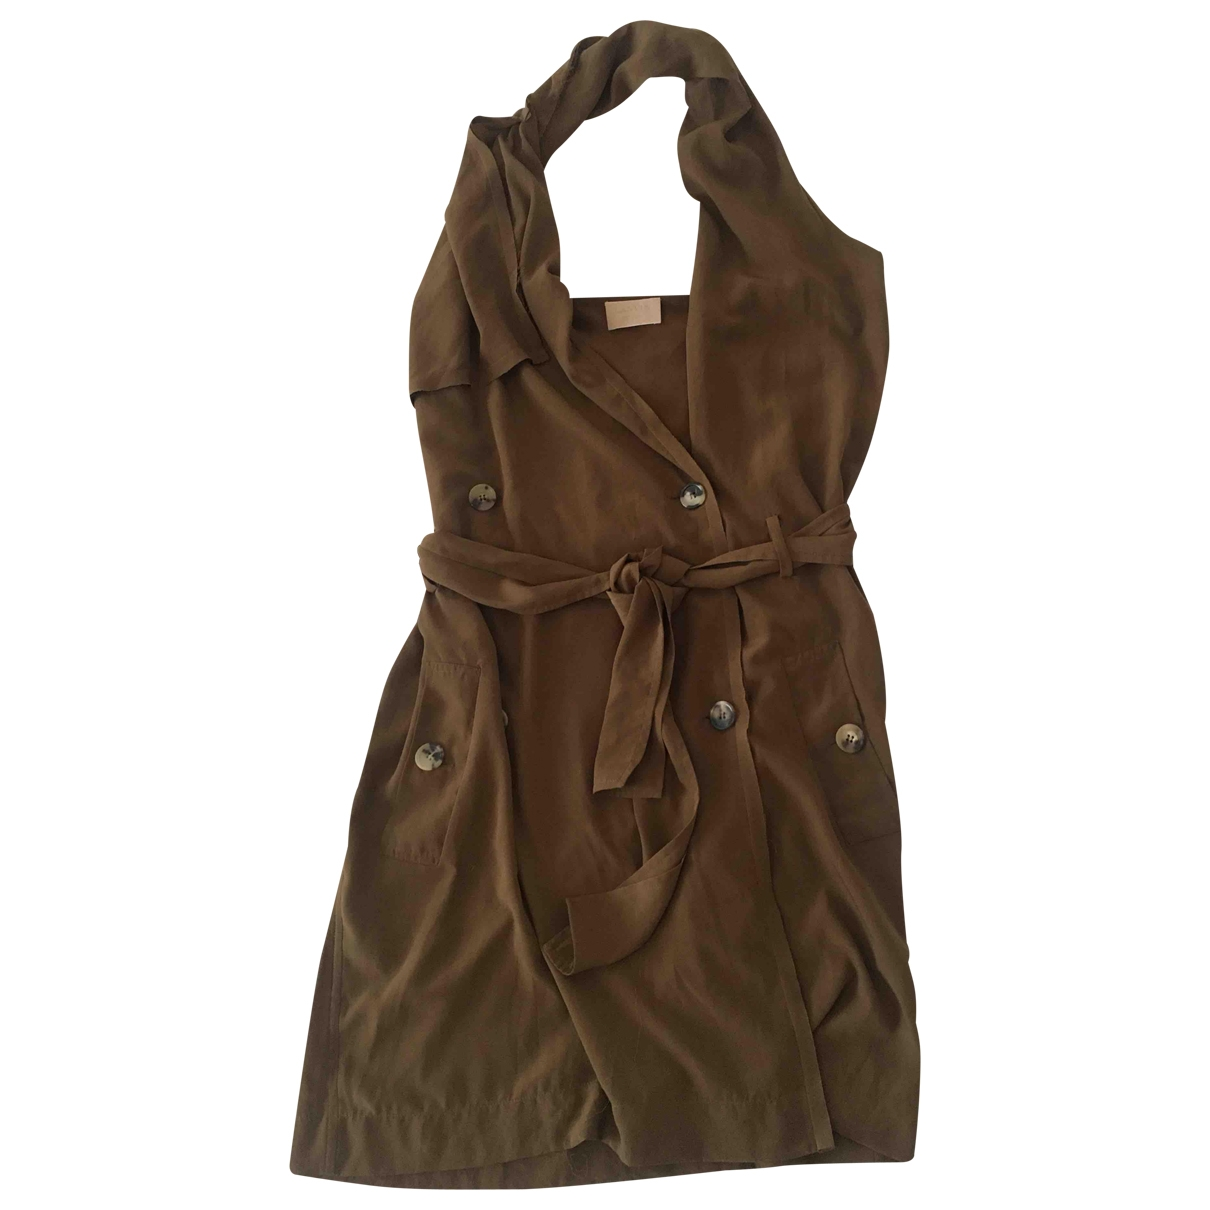 Lanvin \N Kleid in  Khaki Polyester